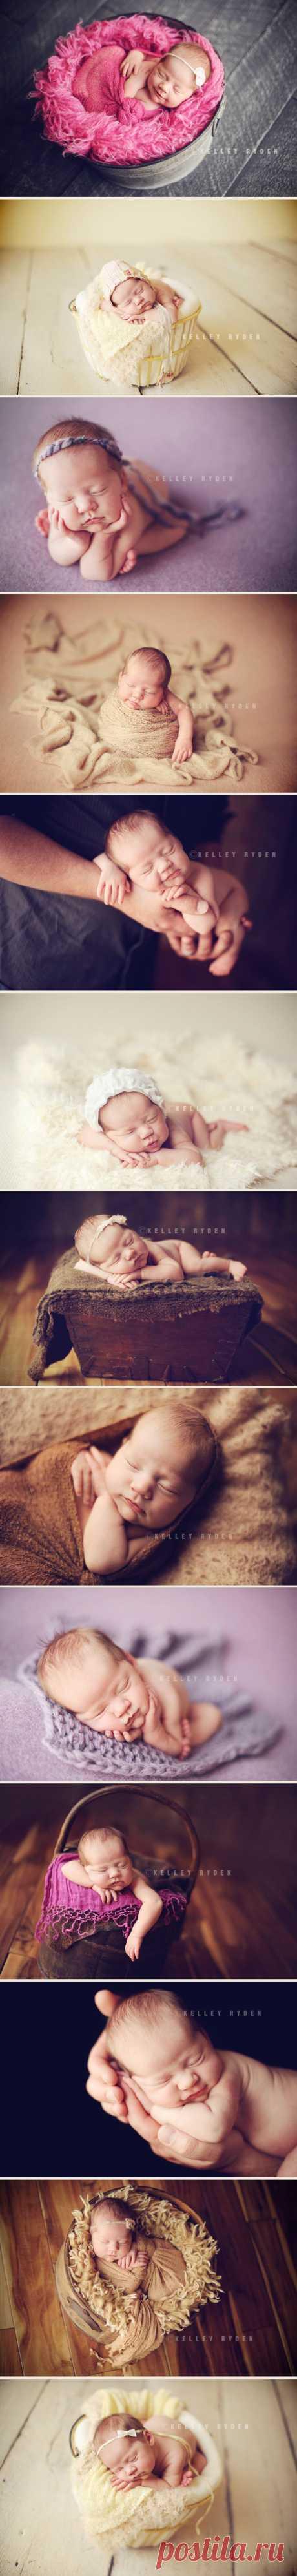 Kelley Ryden newborn photographer, Omaha Nebraska baby photographer